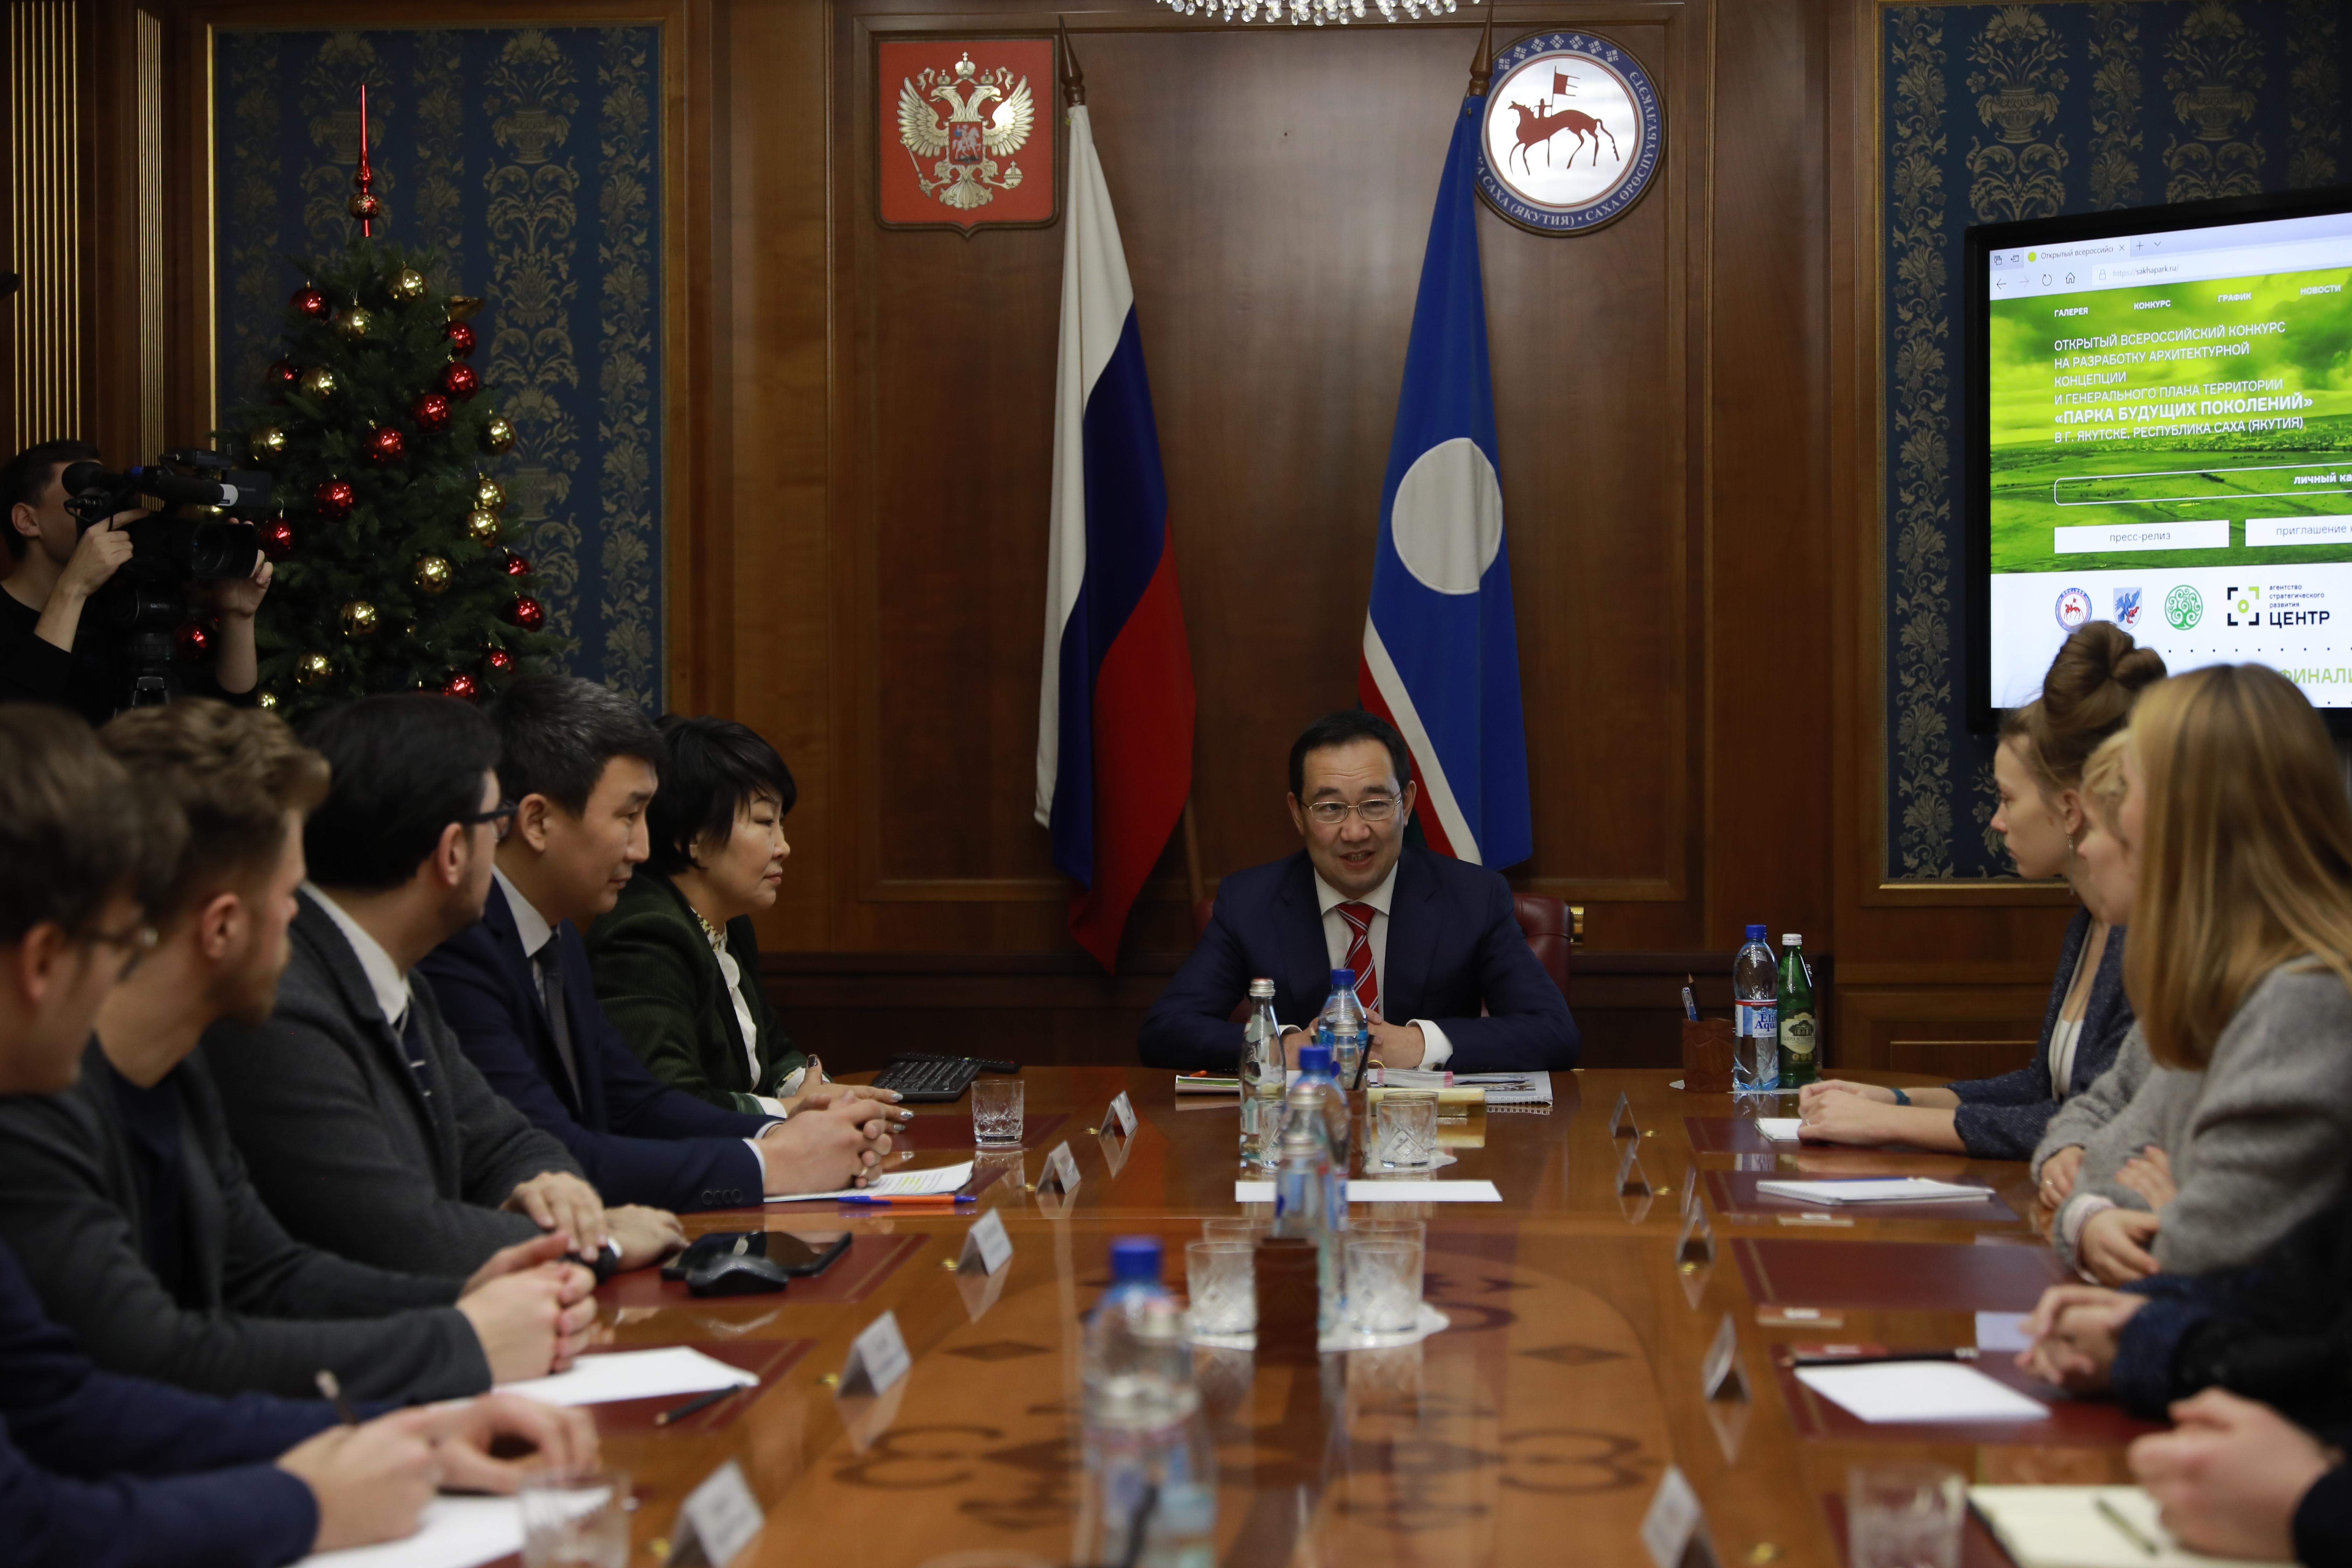 Глава Якутии провел встречу с финалистами конкурса